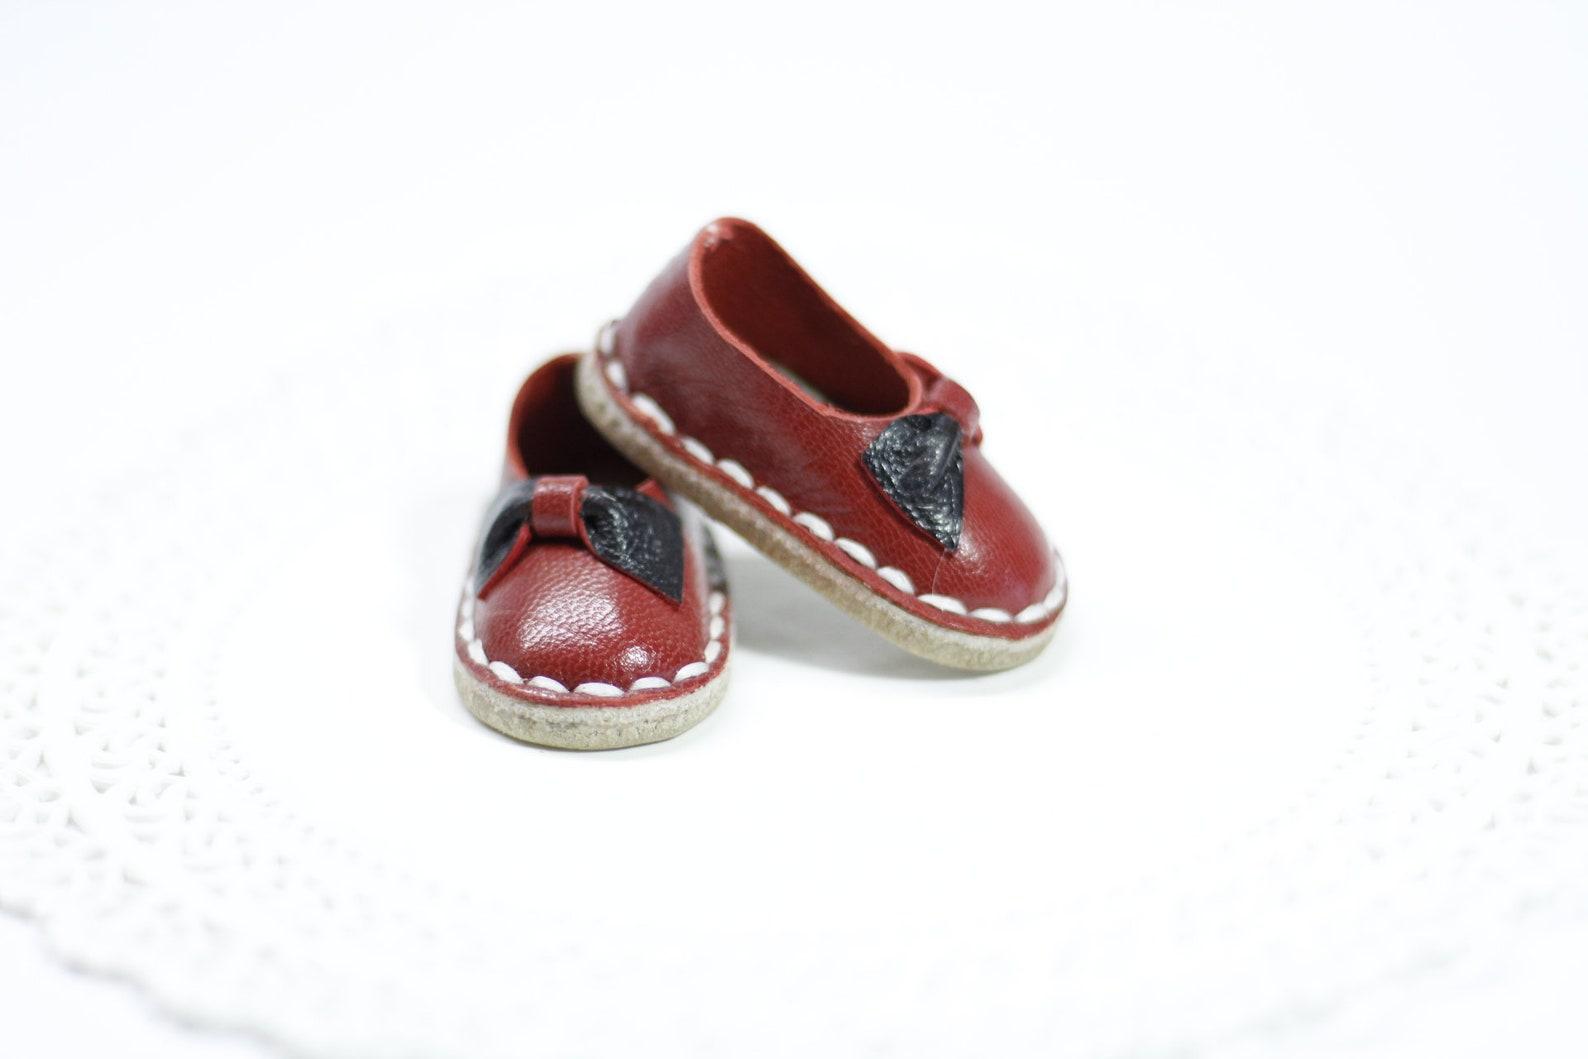 5,3cm-bjd ballet shoes-minifee shoes-a-line minifee fairyland-aktive line minifee-1/4bjd-msd size doll-msd shoes-minifee outfit-